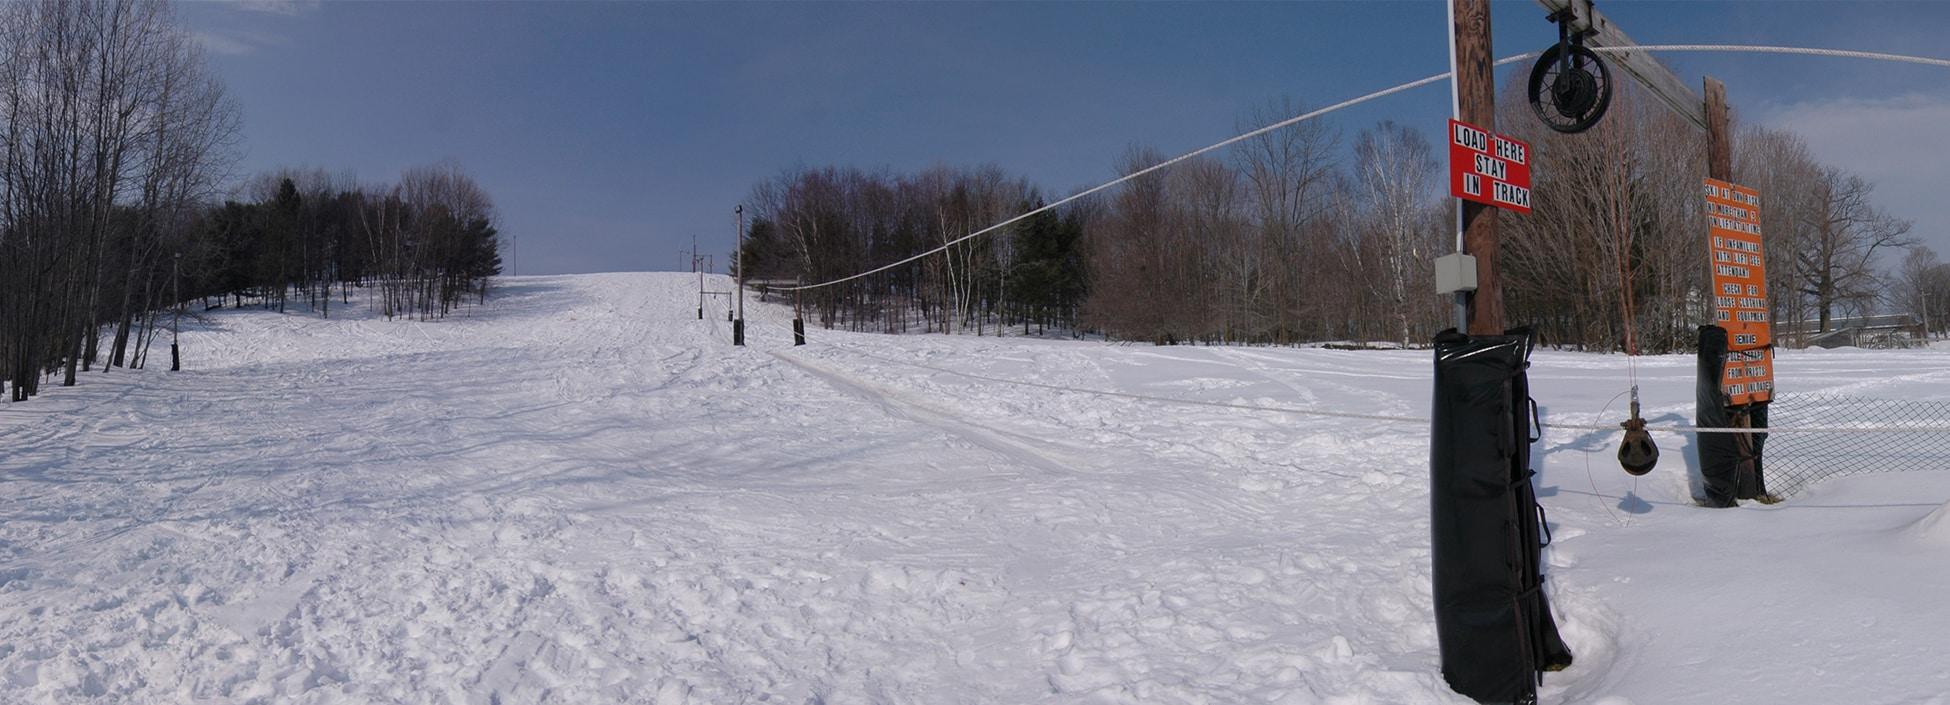 winter, ski hill, Randolph Center campus, rope tow